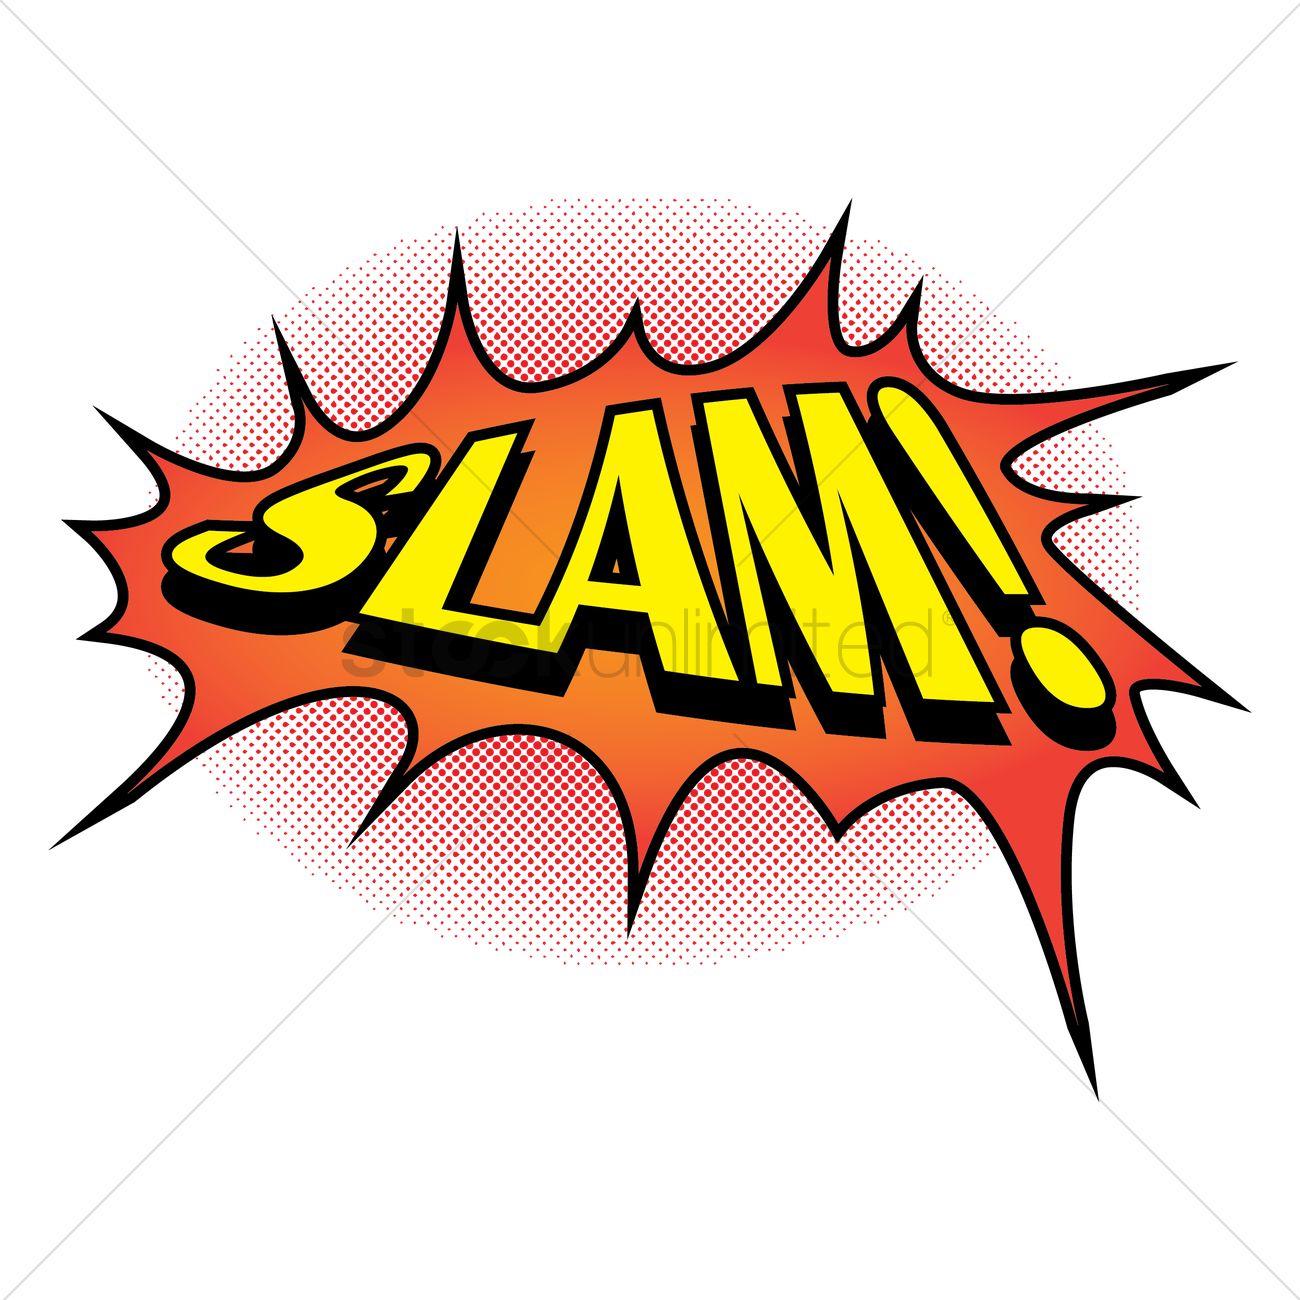 Comic Effect Slam Vector Image 1708408 Stockunlimited